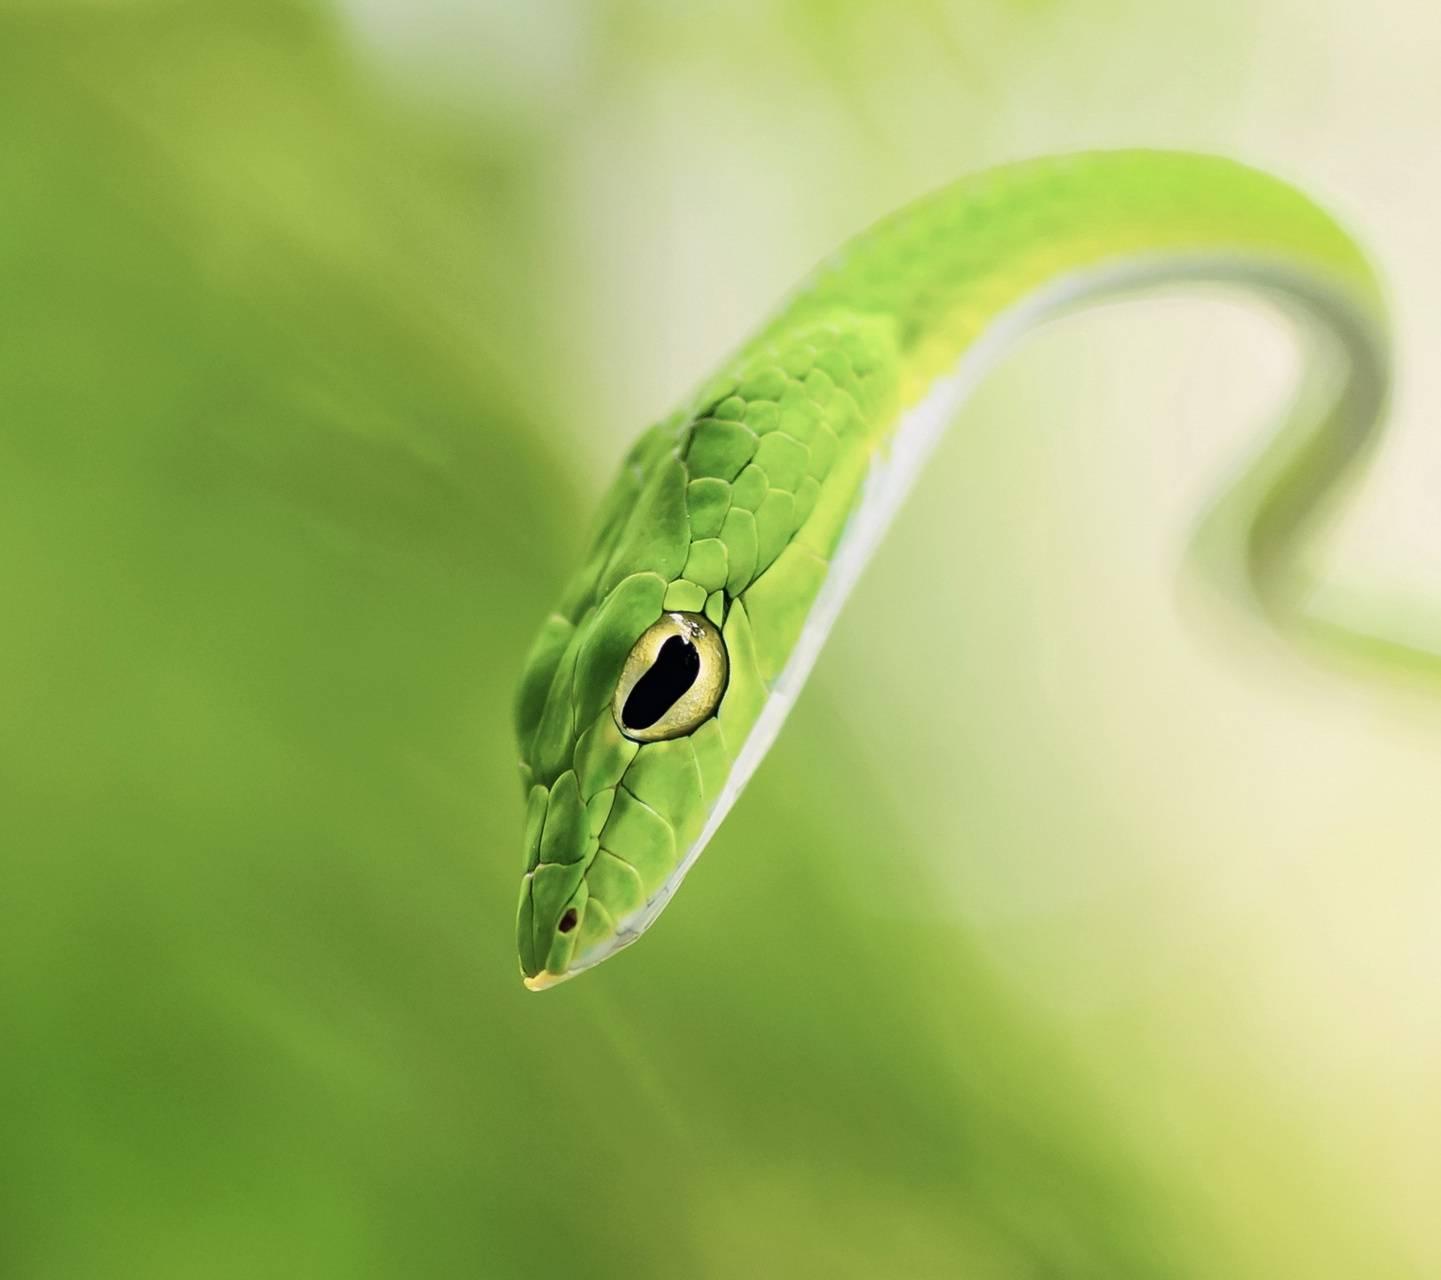 Green Snake Hd